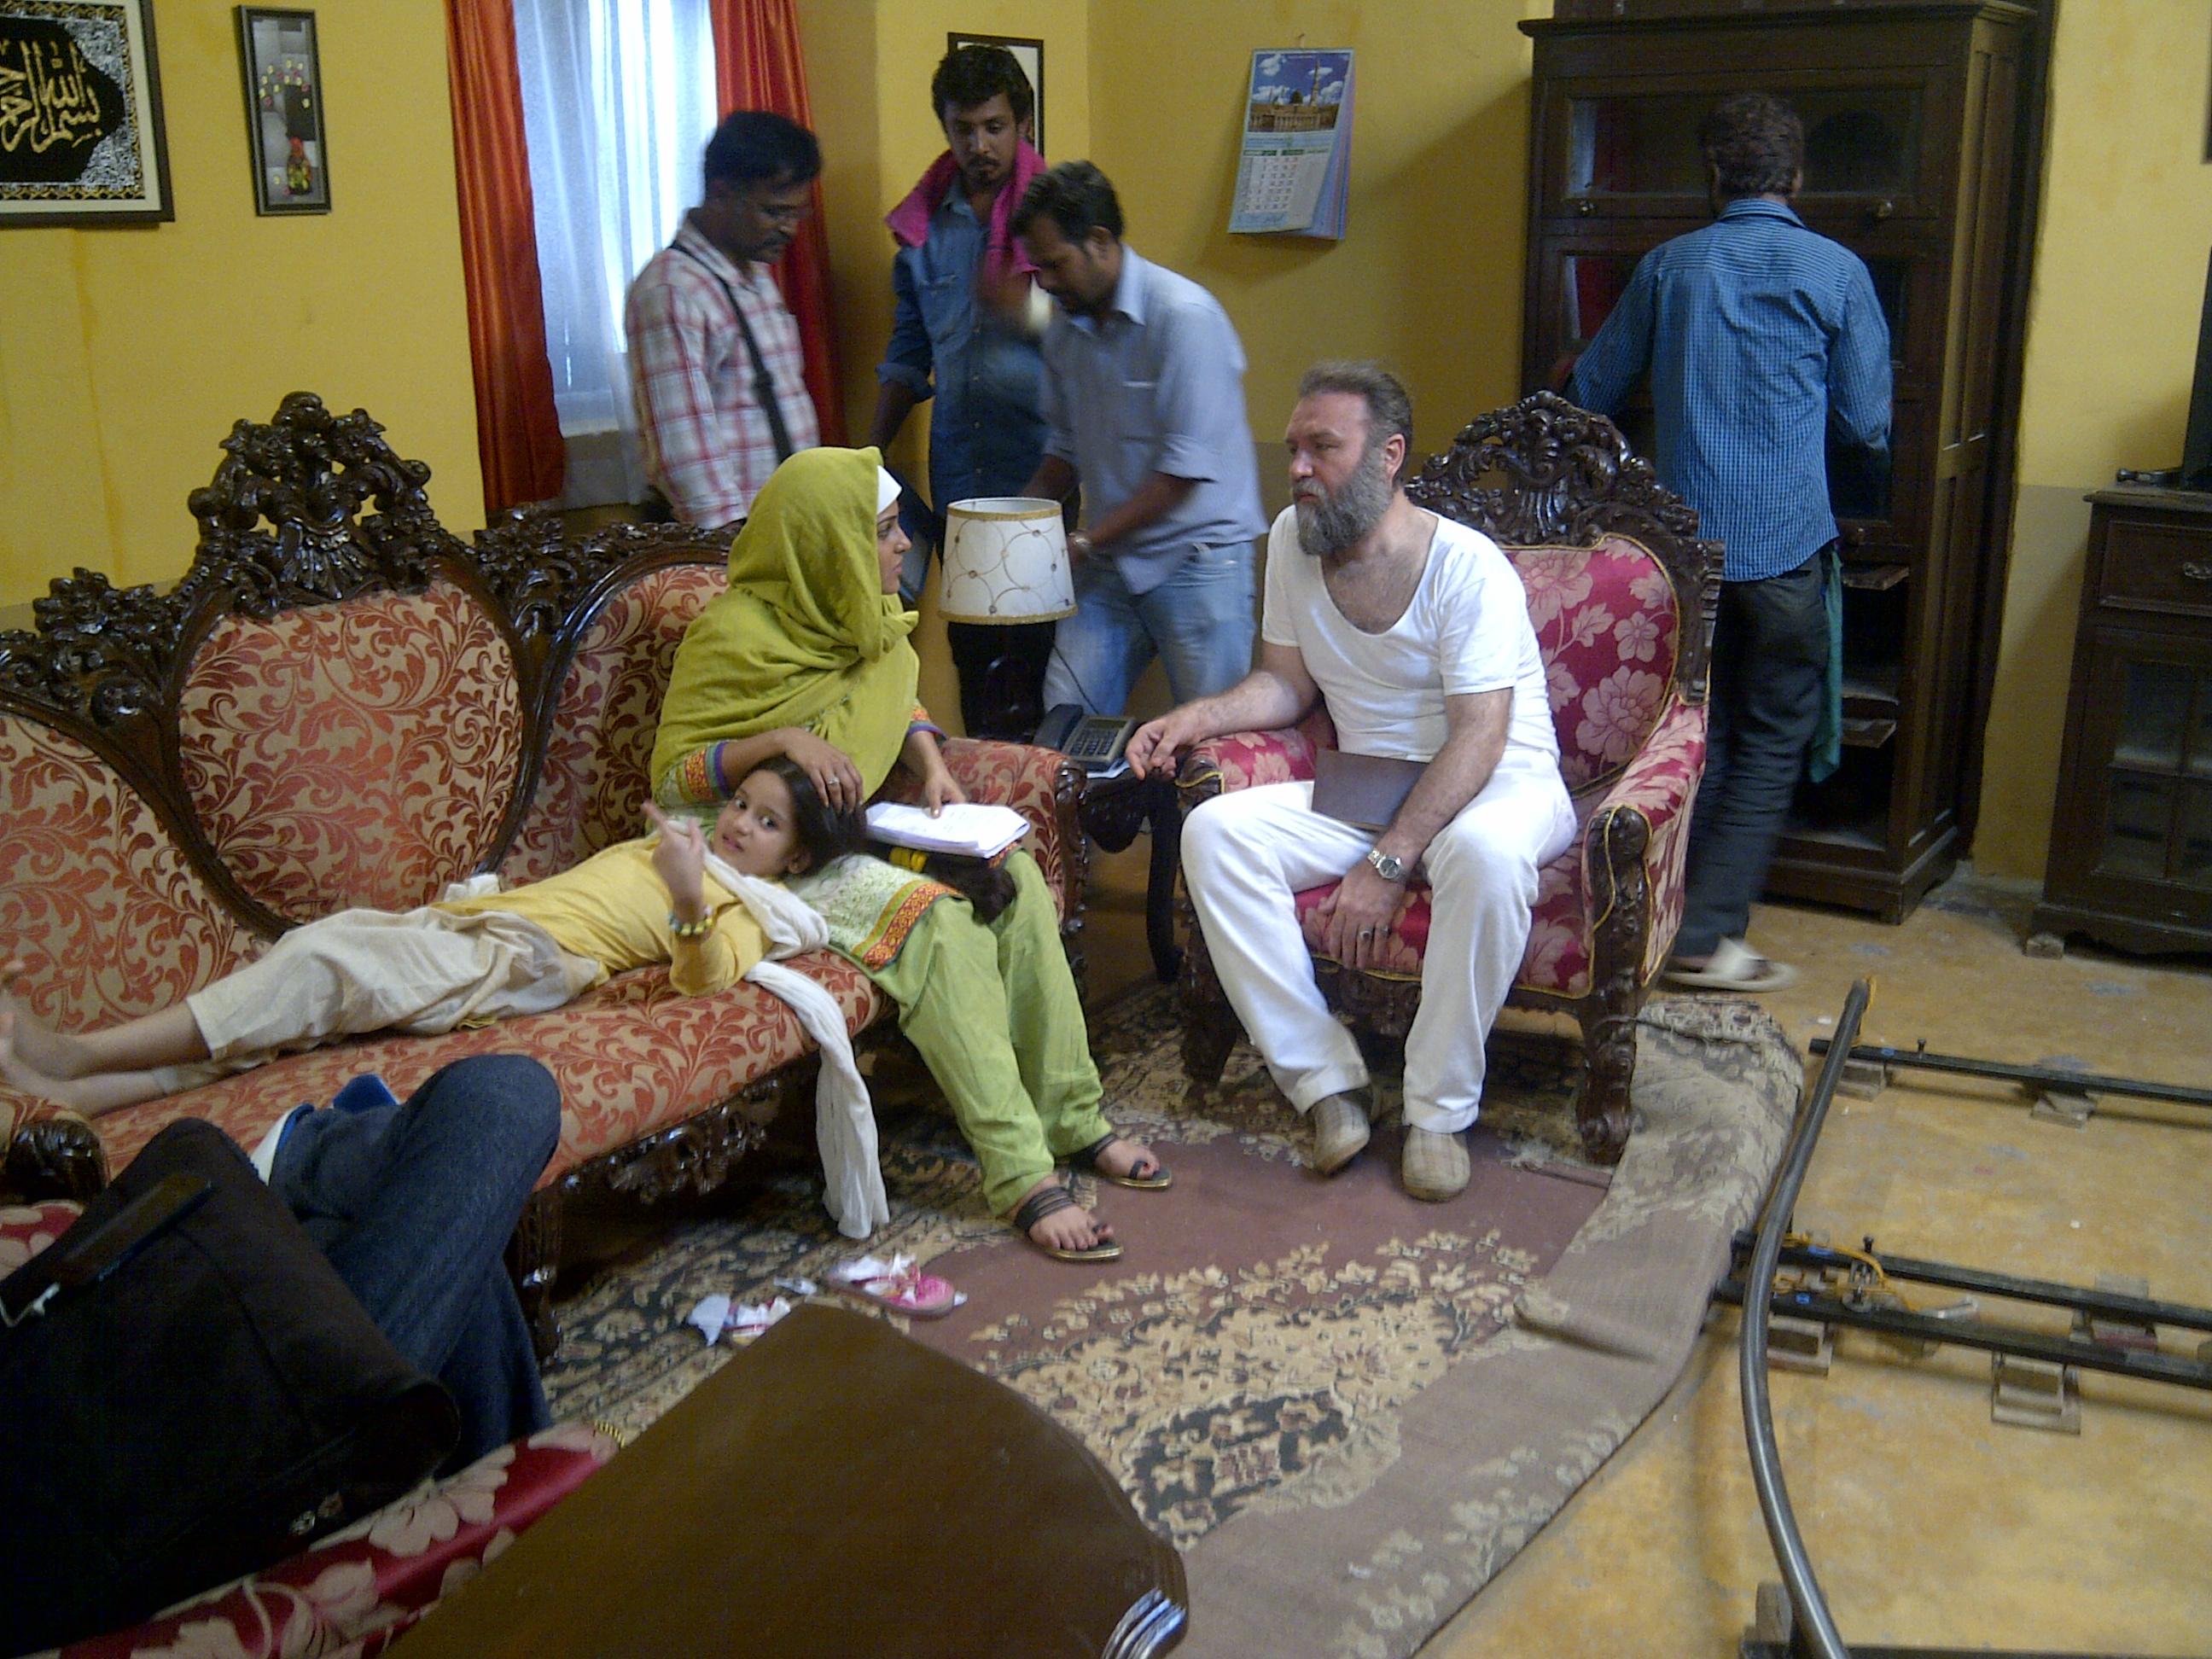 Jagruti Sethia and Avantika Shetty in Khorshid (2016)